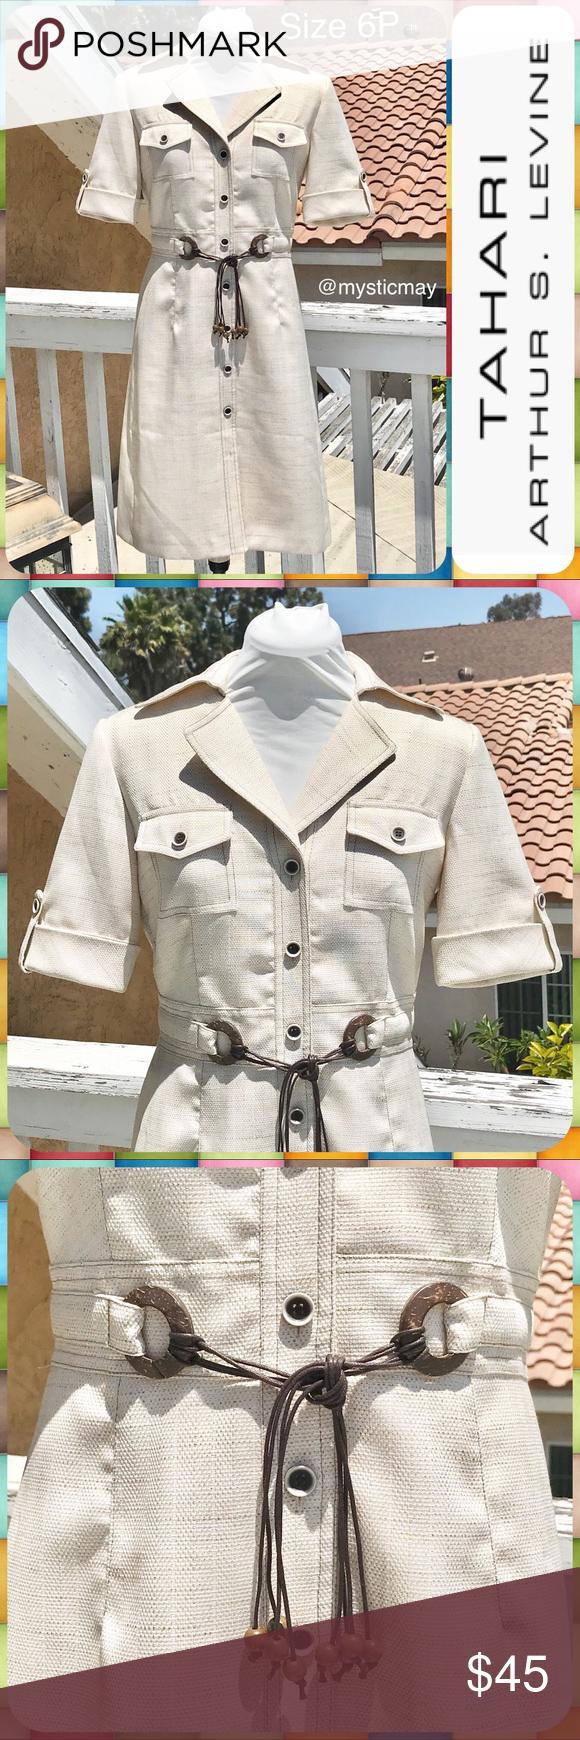 2271ed85beeba TAHARI ASL Beige Woven Belted Shirt Dress Sz 6P Gorgeous Shirt Dress from  Tahari ASL with